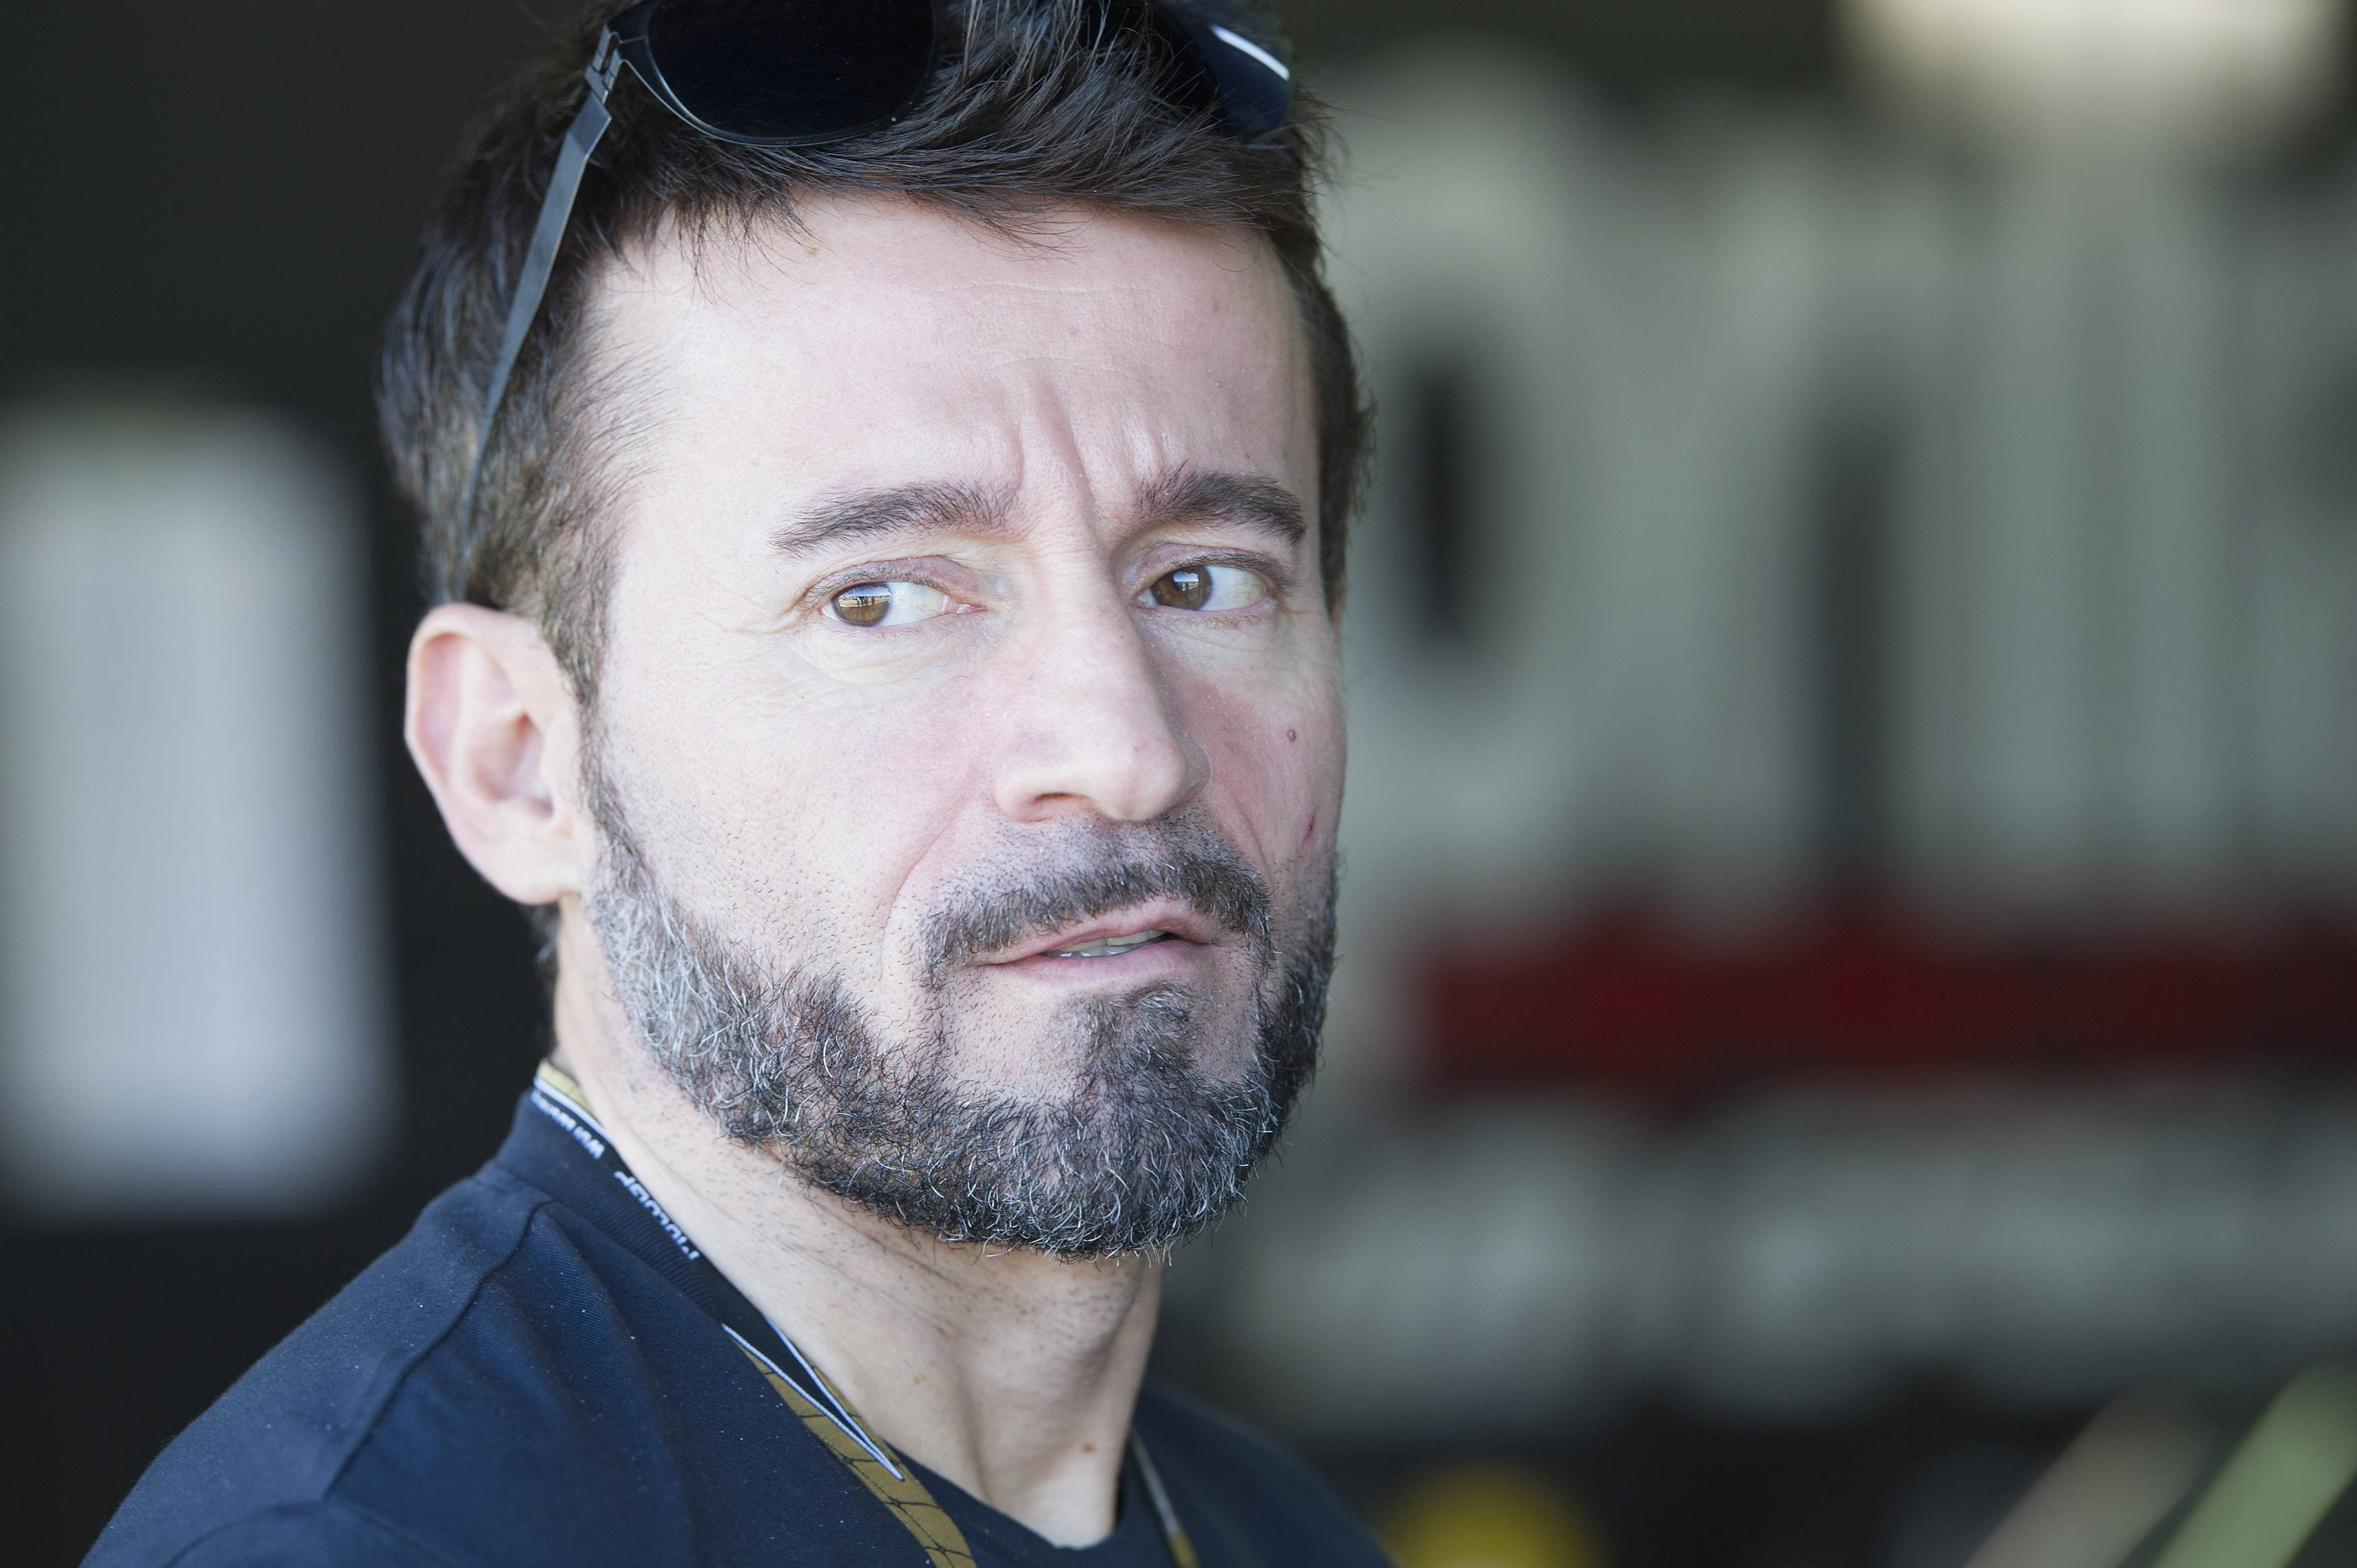 Max Biaggi-Bianca Atzei, l'ex pilota spiega il perché della rottura